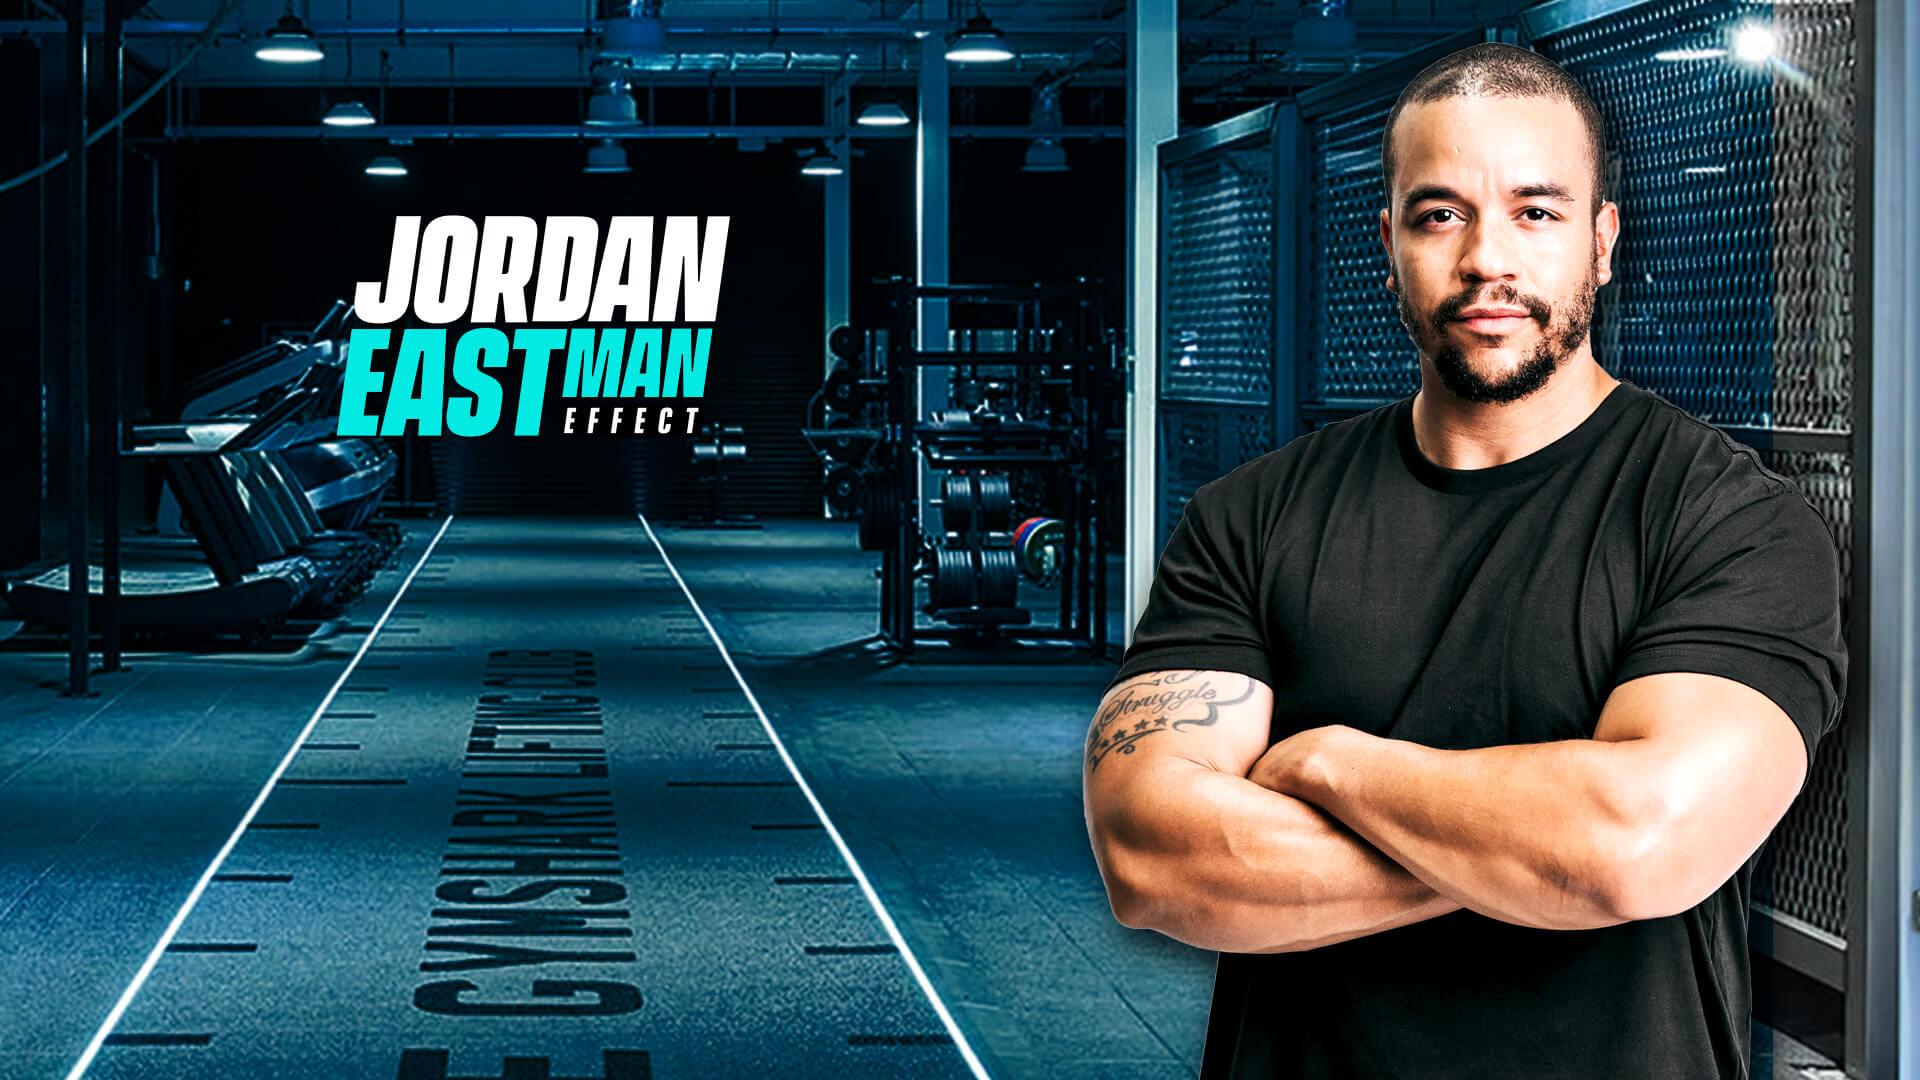 Jordan Eastman